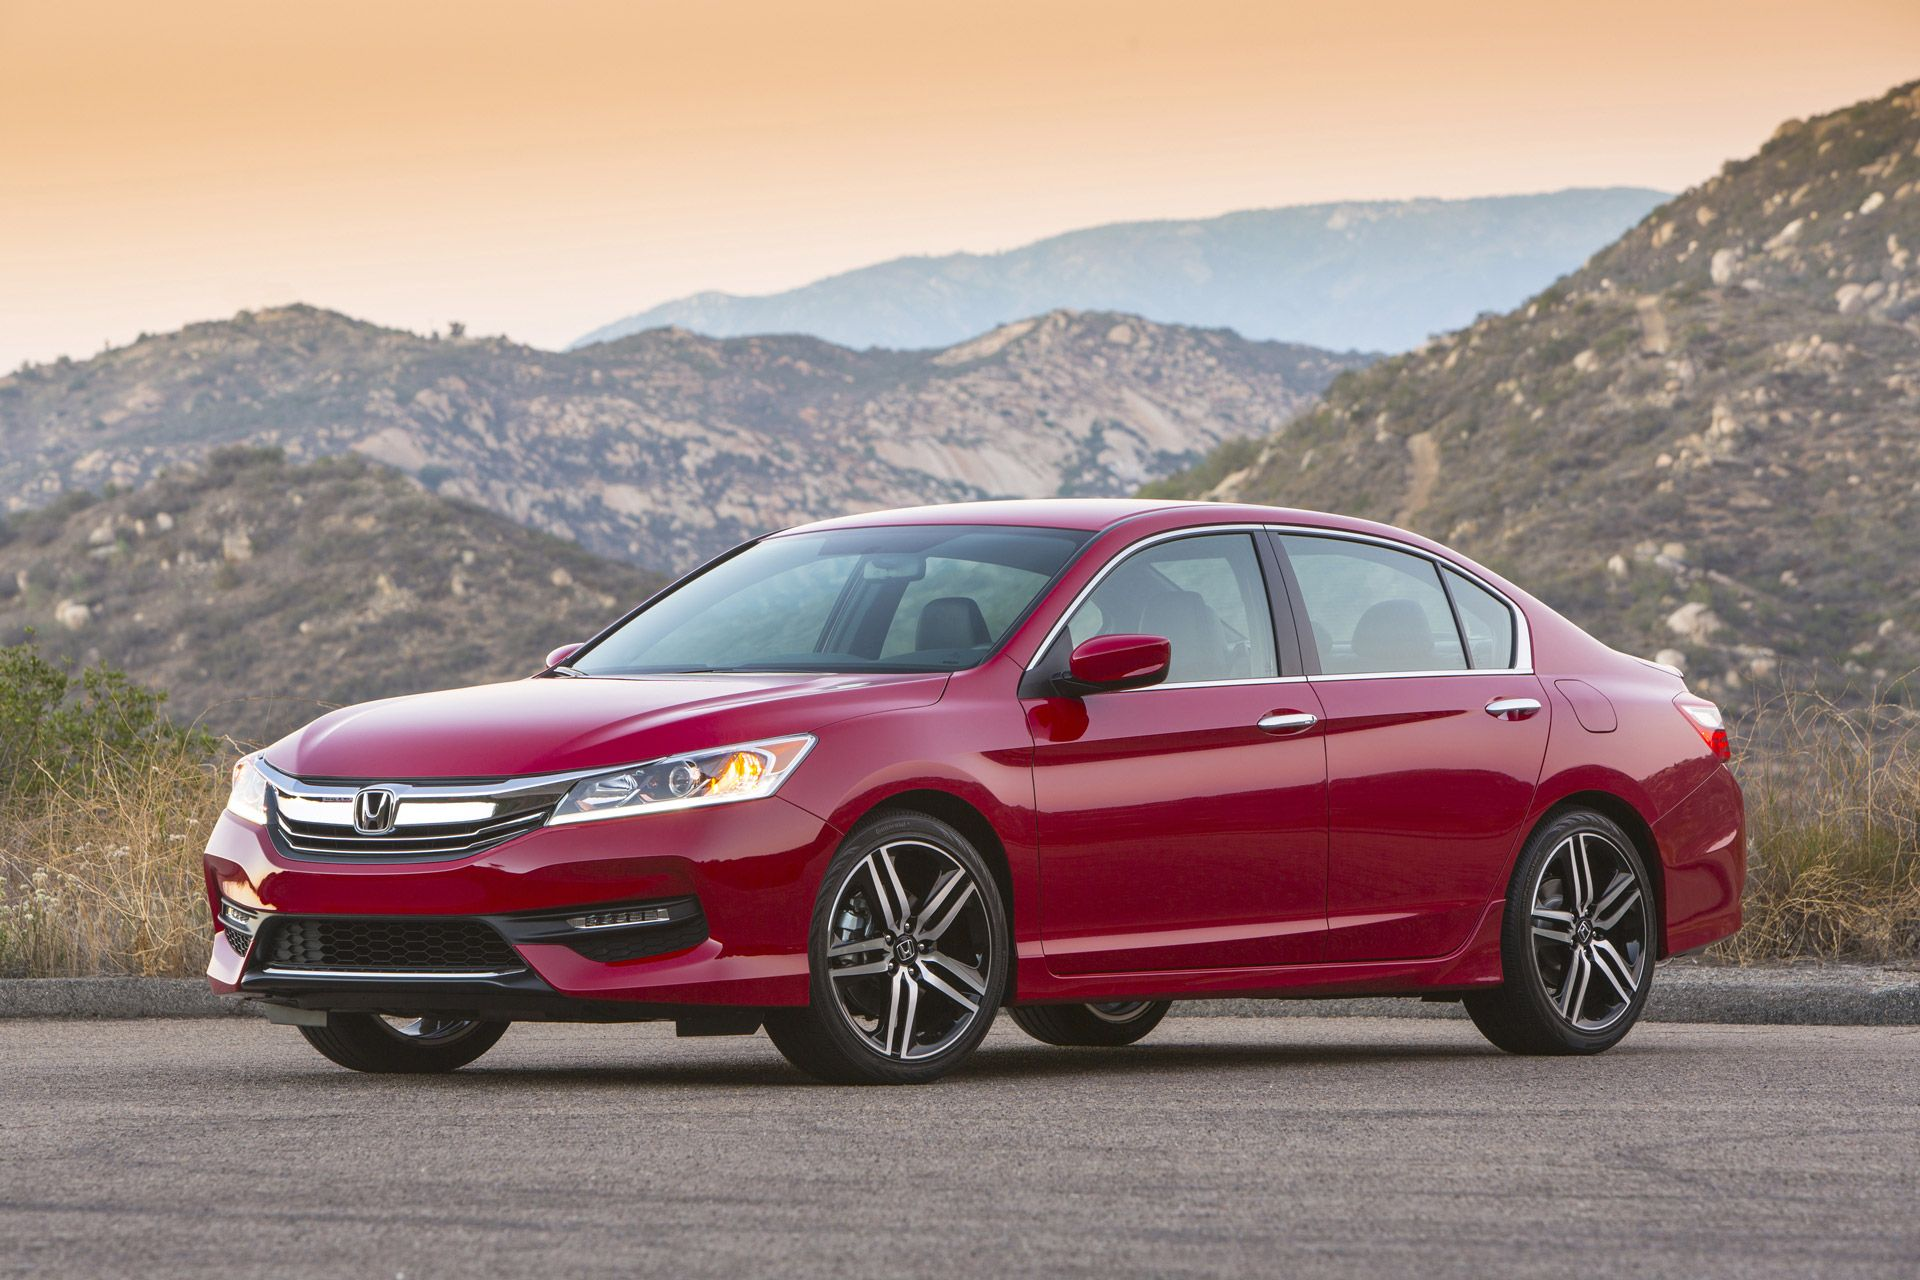 2013 2016 Honda Accord Recalled To Fix Battery Glitch Honda Accord Sport Honda Accord Accord Sport